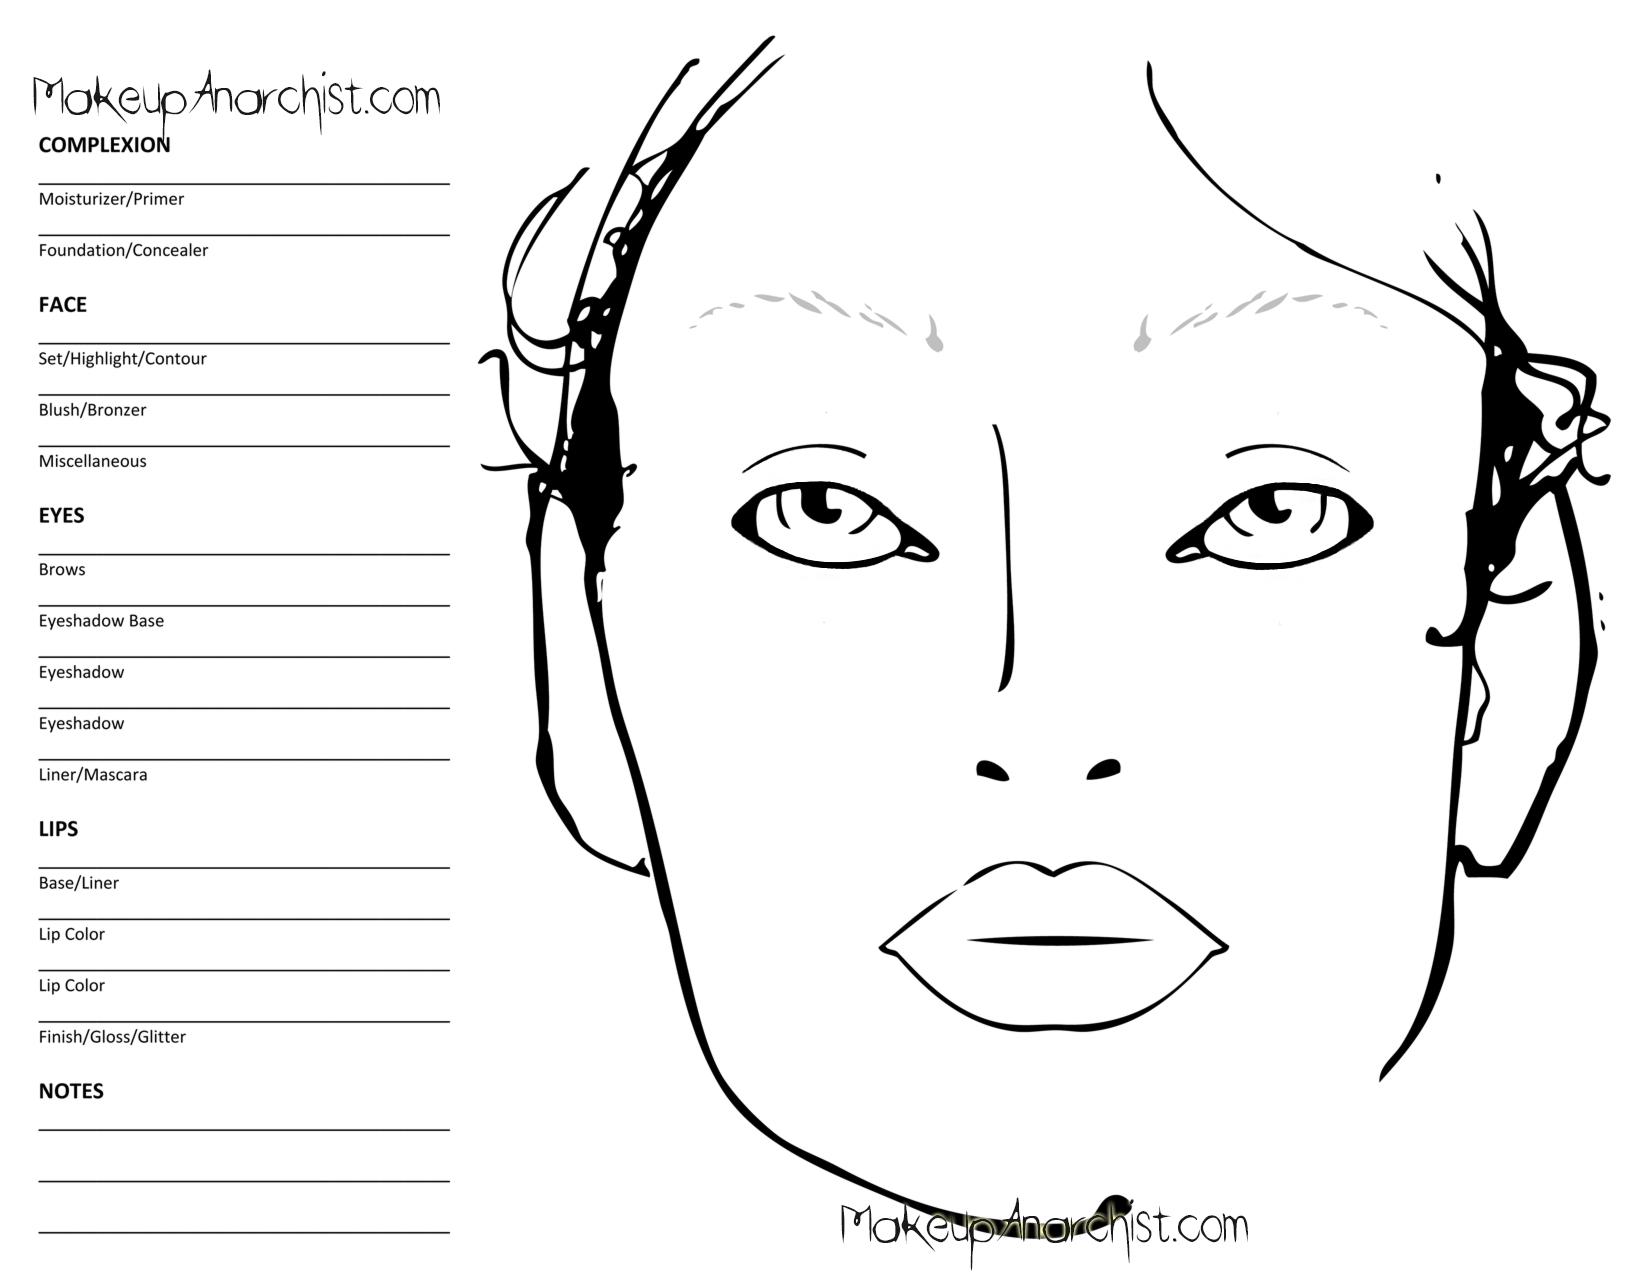 Blank Mac Face Charts